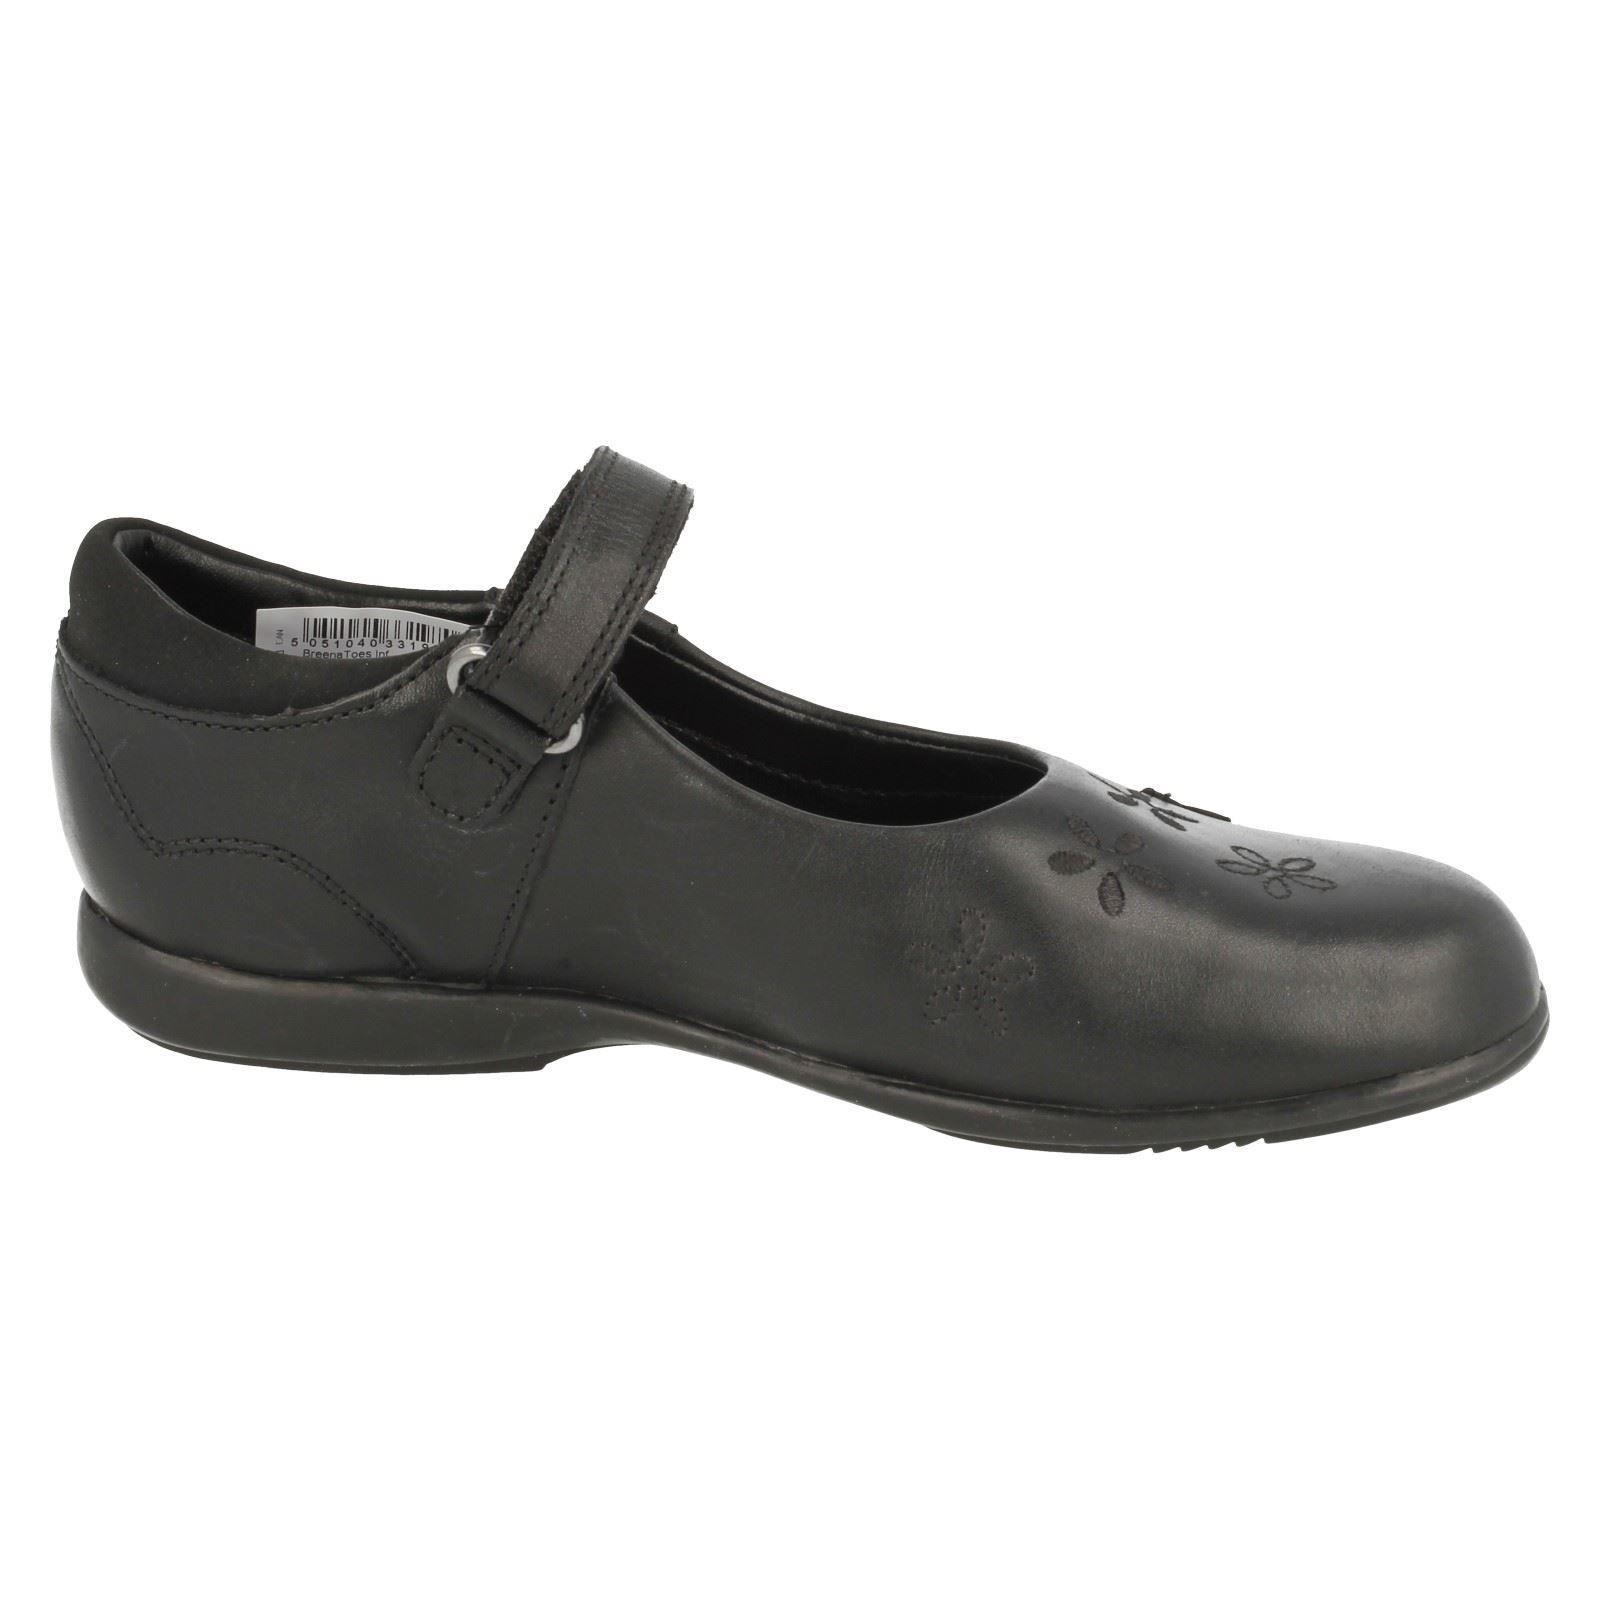 "Girls Clarks School Shoes /""Breena Toes/"""